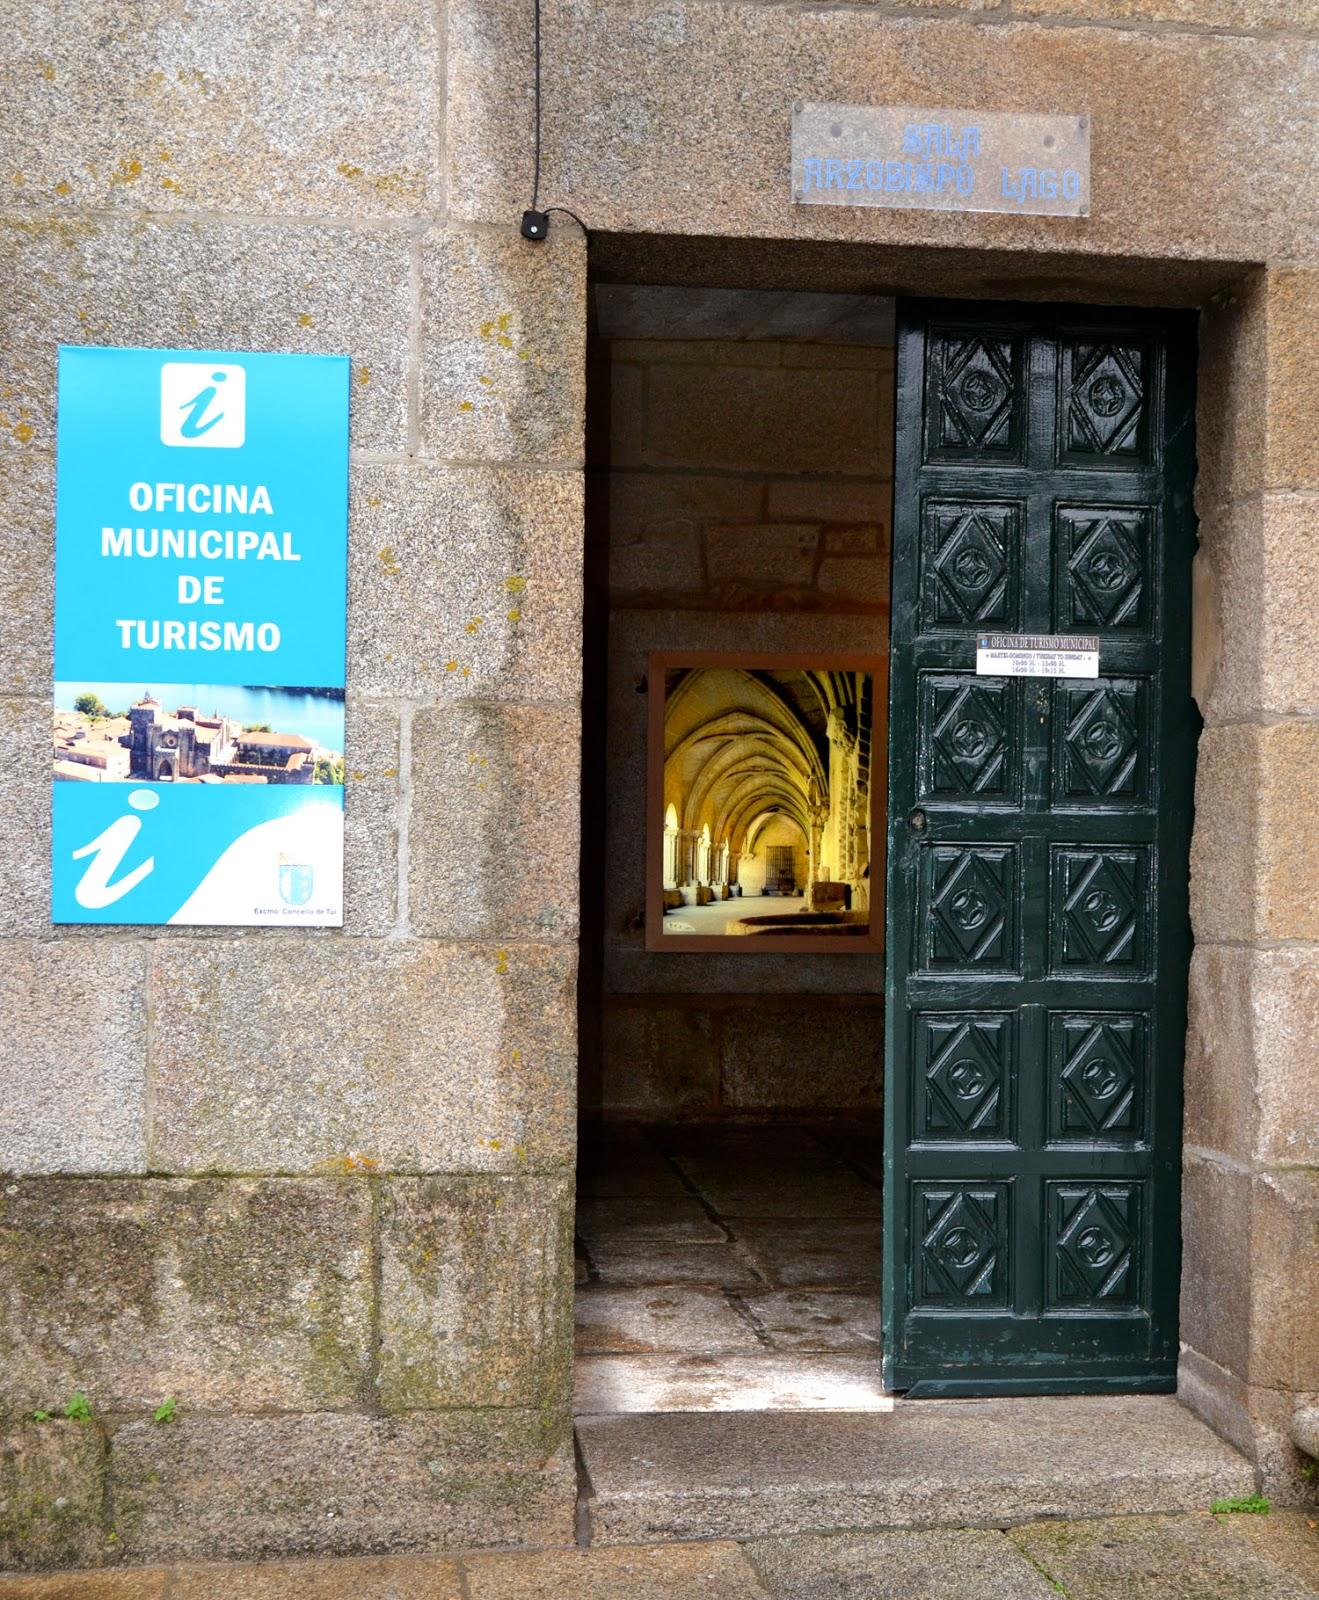 Valen a tui info a oficina municipal de turismo de tui for Oficina de turismo benasque